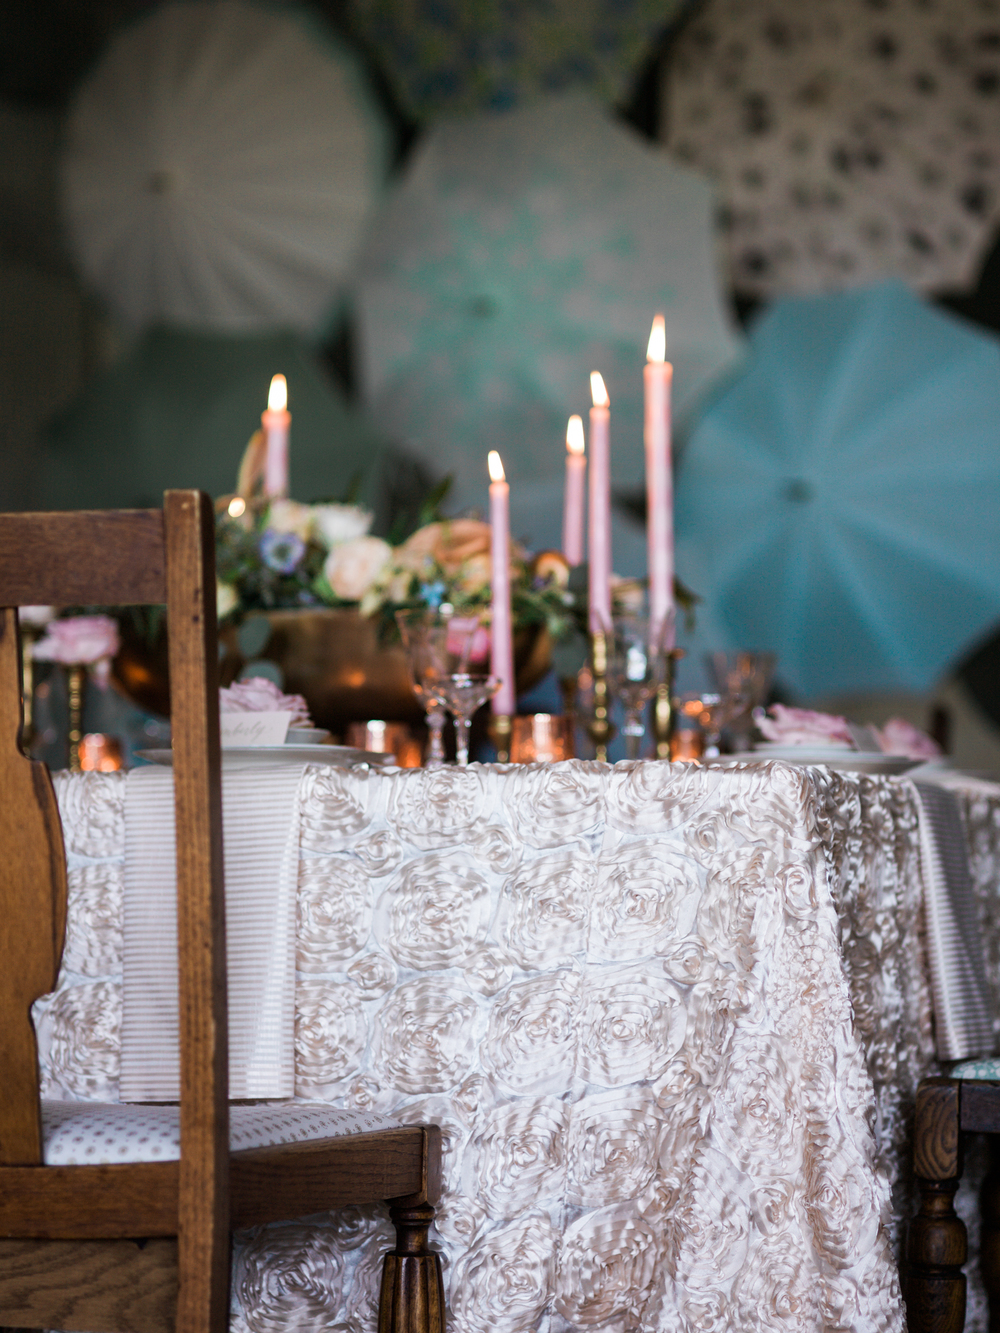 Bella Umbrella Vintage Rentals | Alante Photography | Seattle Wedding Planning